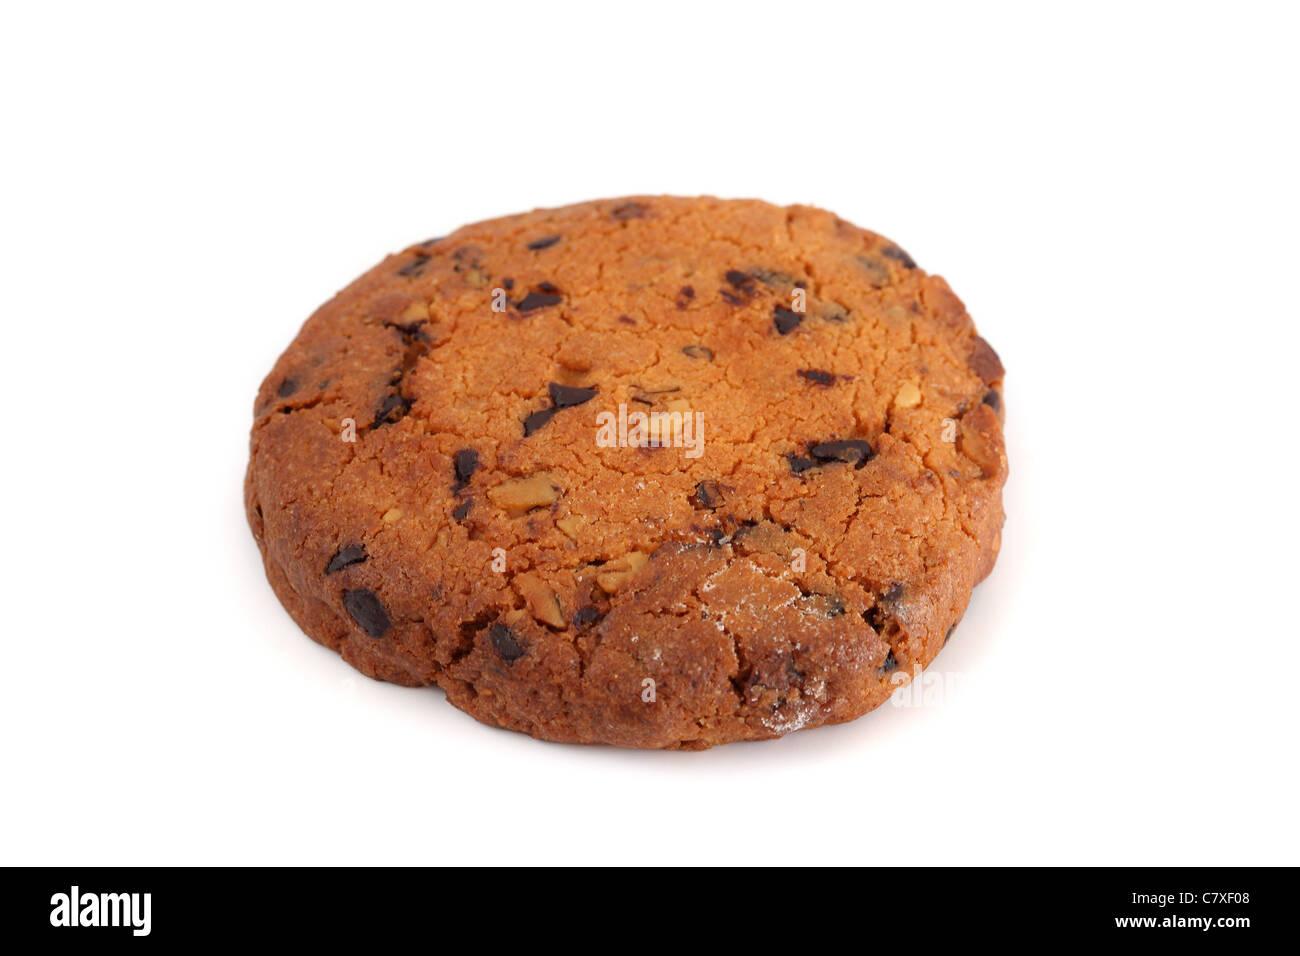 Biscuit noisettes chocolat Chocolate hazelnut biscuit - Stock Image